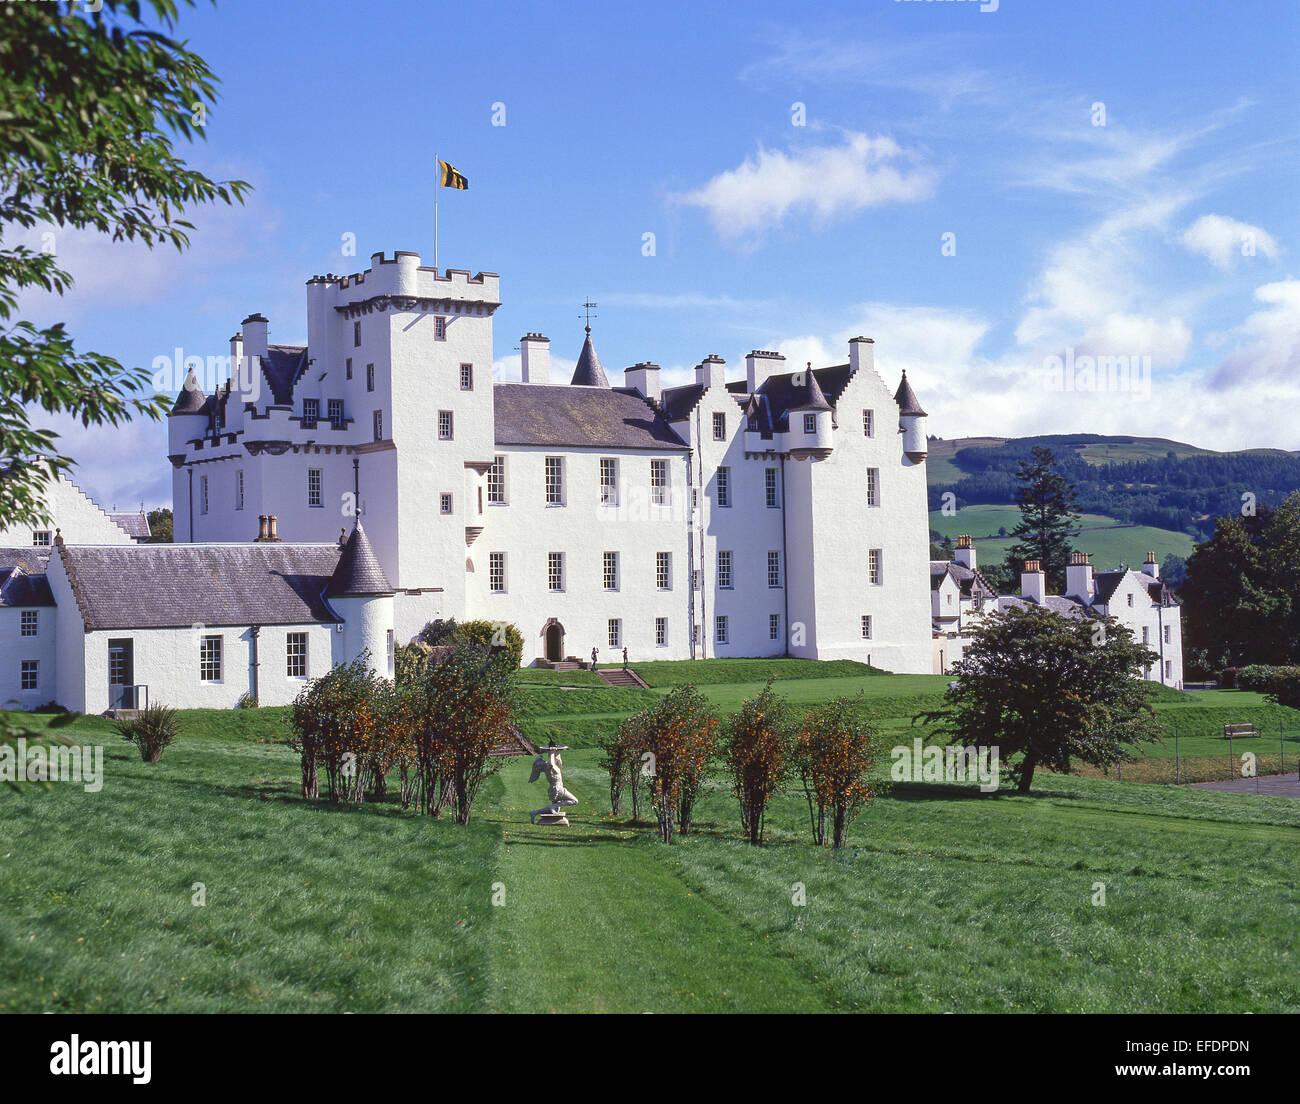 13th century Blair Castle, Blair Atholl, Perth and Kinross, Scotland, United Kingdom - Stock Image